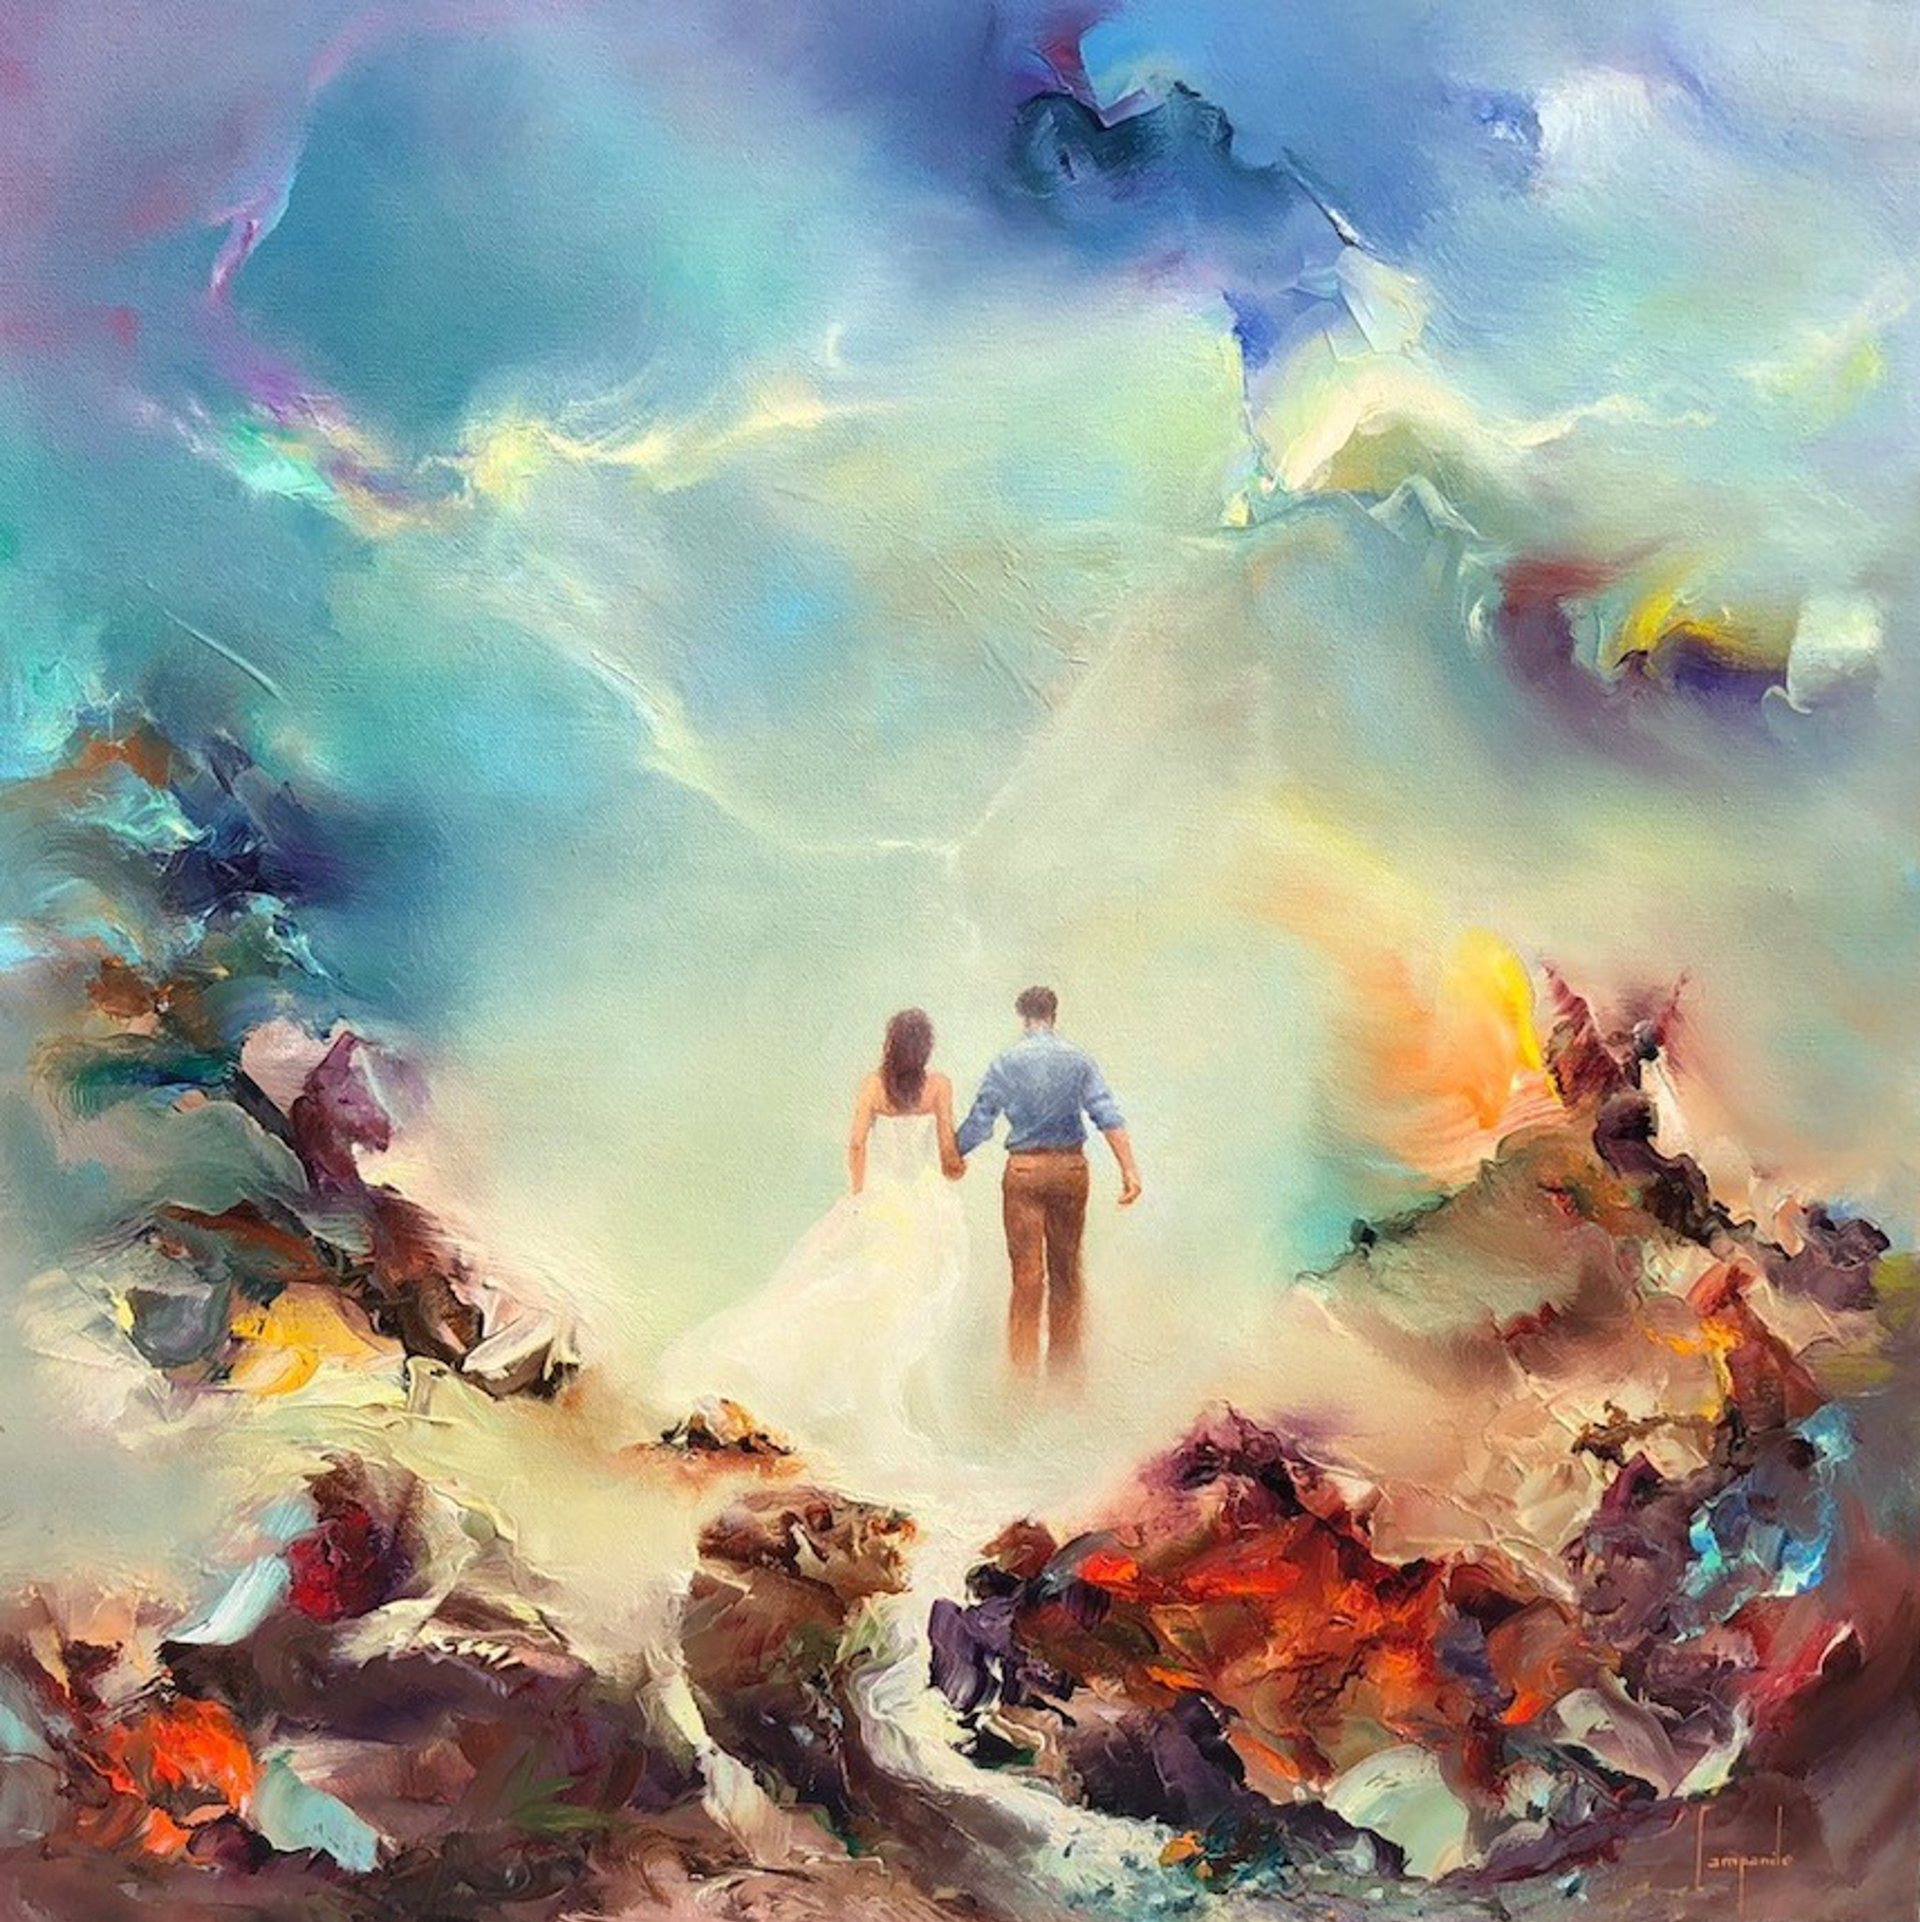 Beyond Love by Dario Campanile